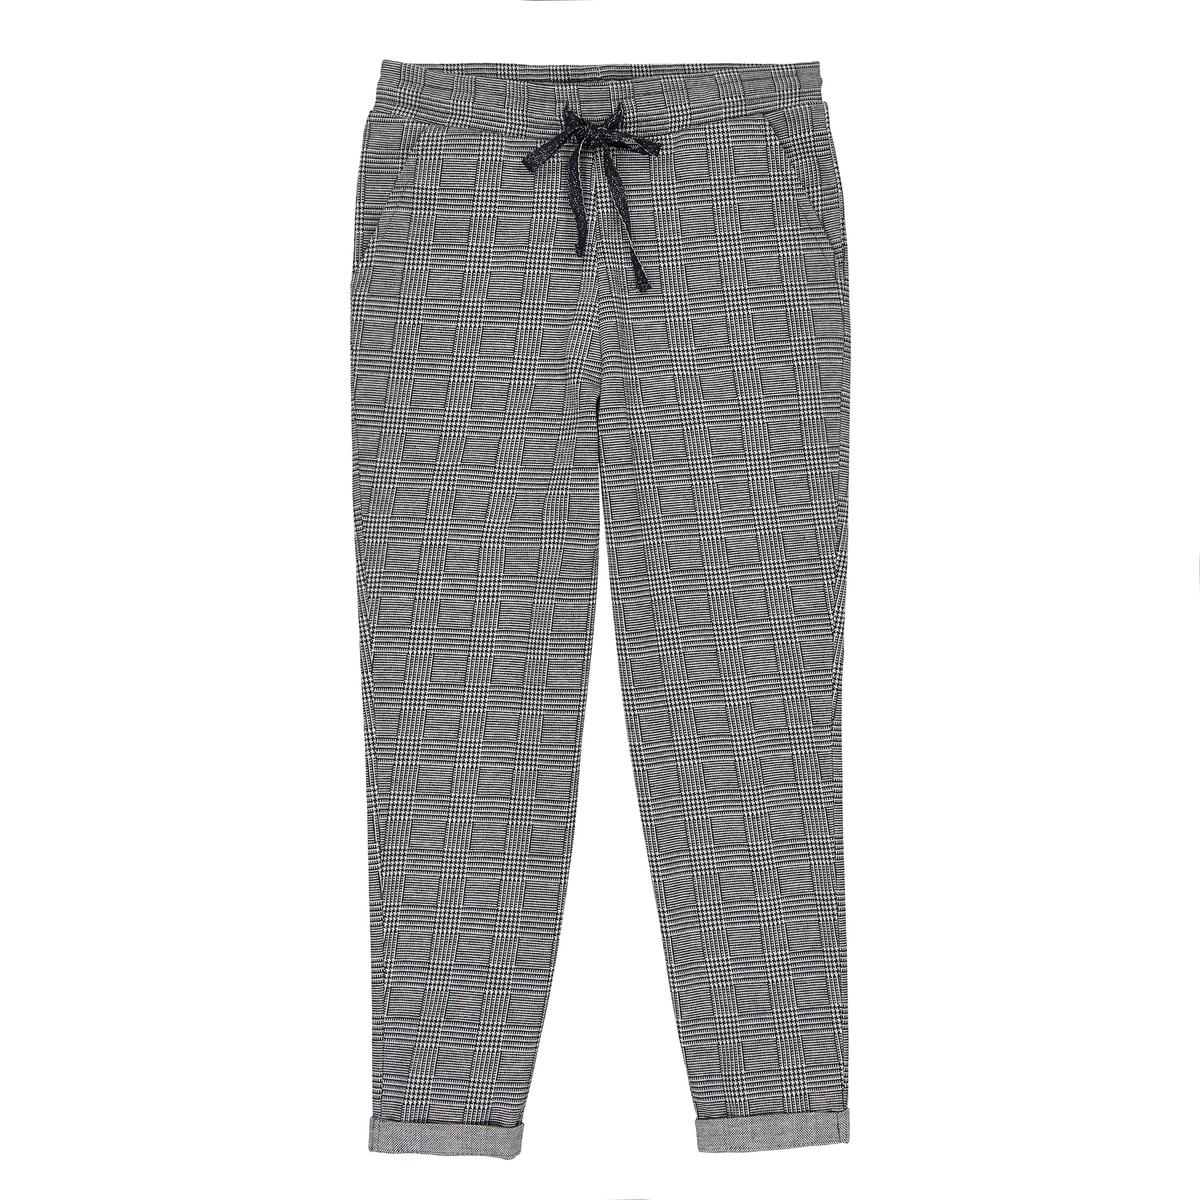 Pantaloni a quadri in felpa 3 - 12 anni